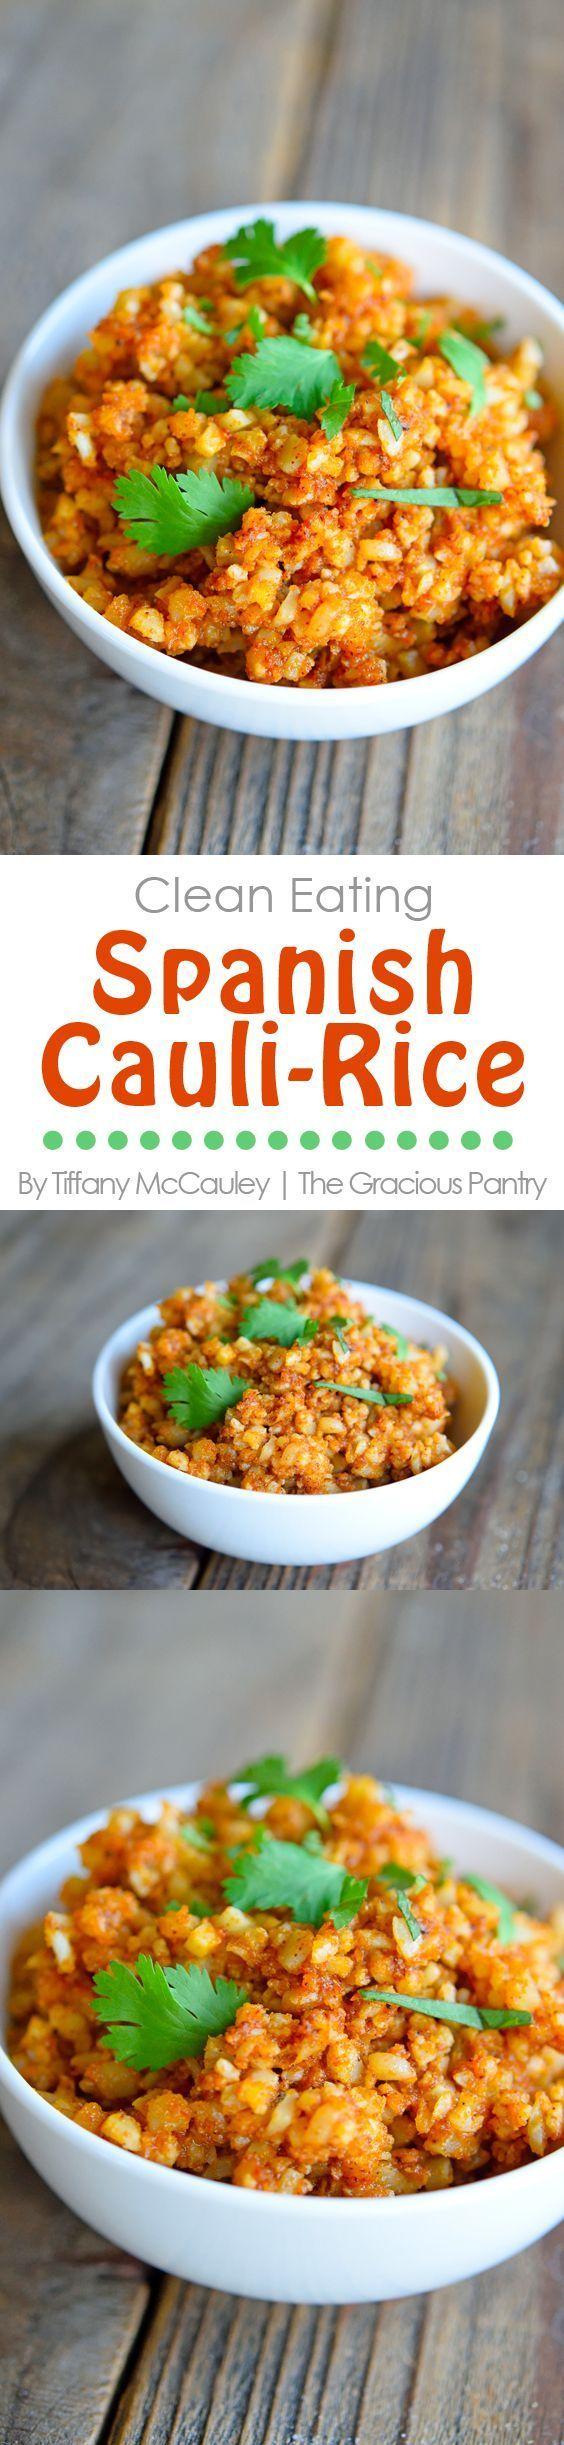 Clean Eating Recipes   Spanish Rice Recipe   Mexican Rice Recipe   Cauliflower Rice Recipe   Healthy Recipes